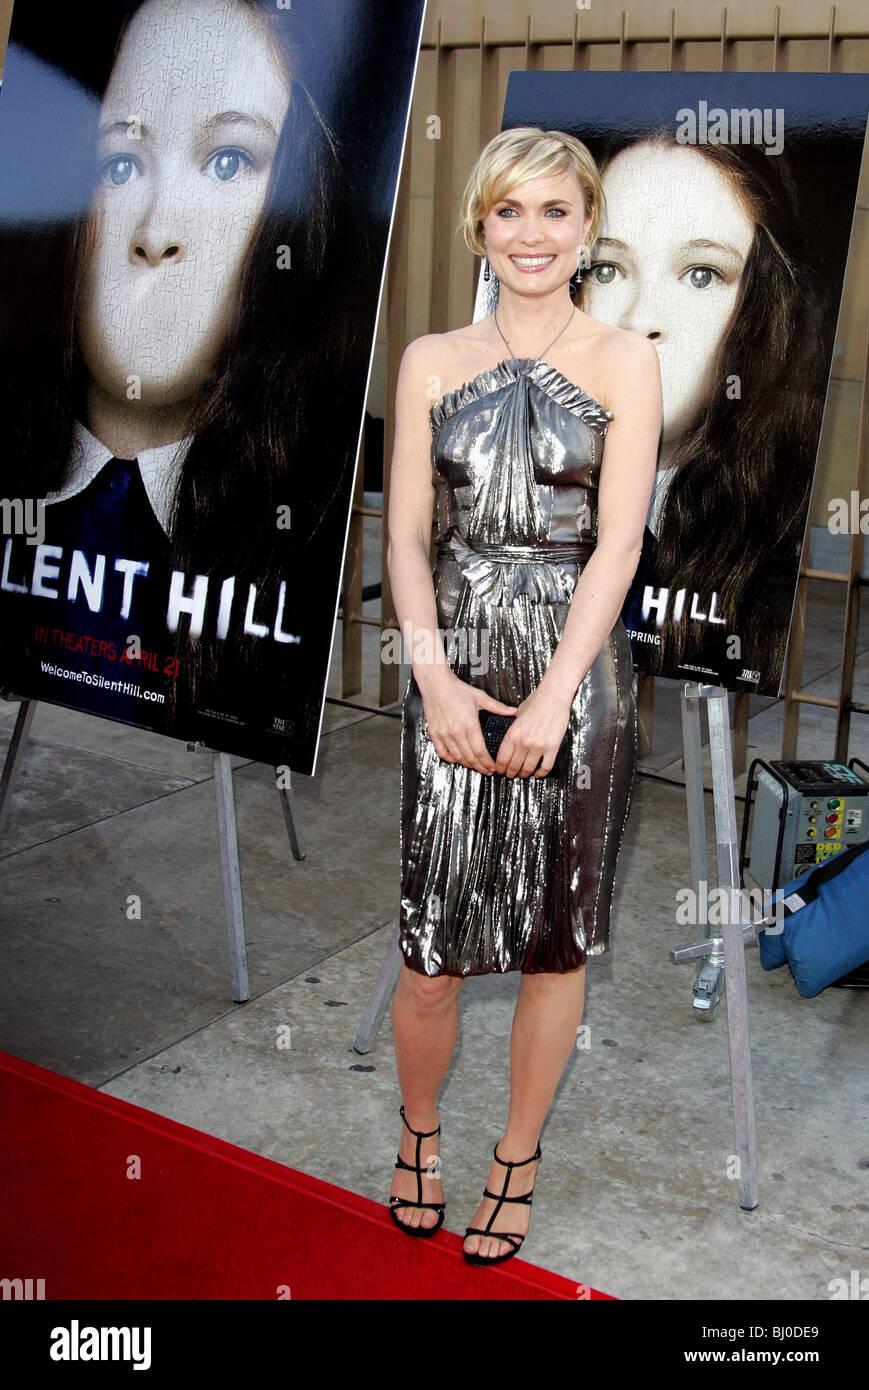 RADHA MITCHELL ACTRESS HOLLYWOOD  LOS ANGELES  USA 20/04/2006 - Stock Image